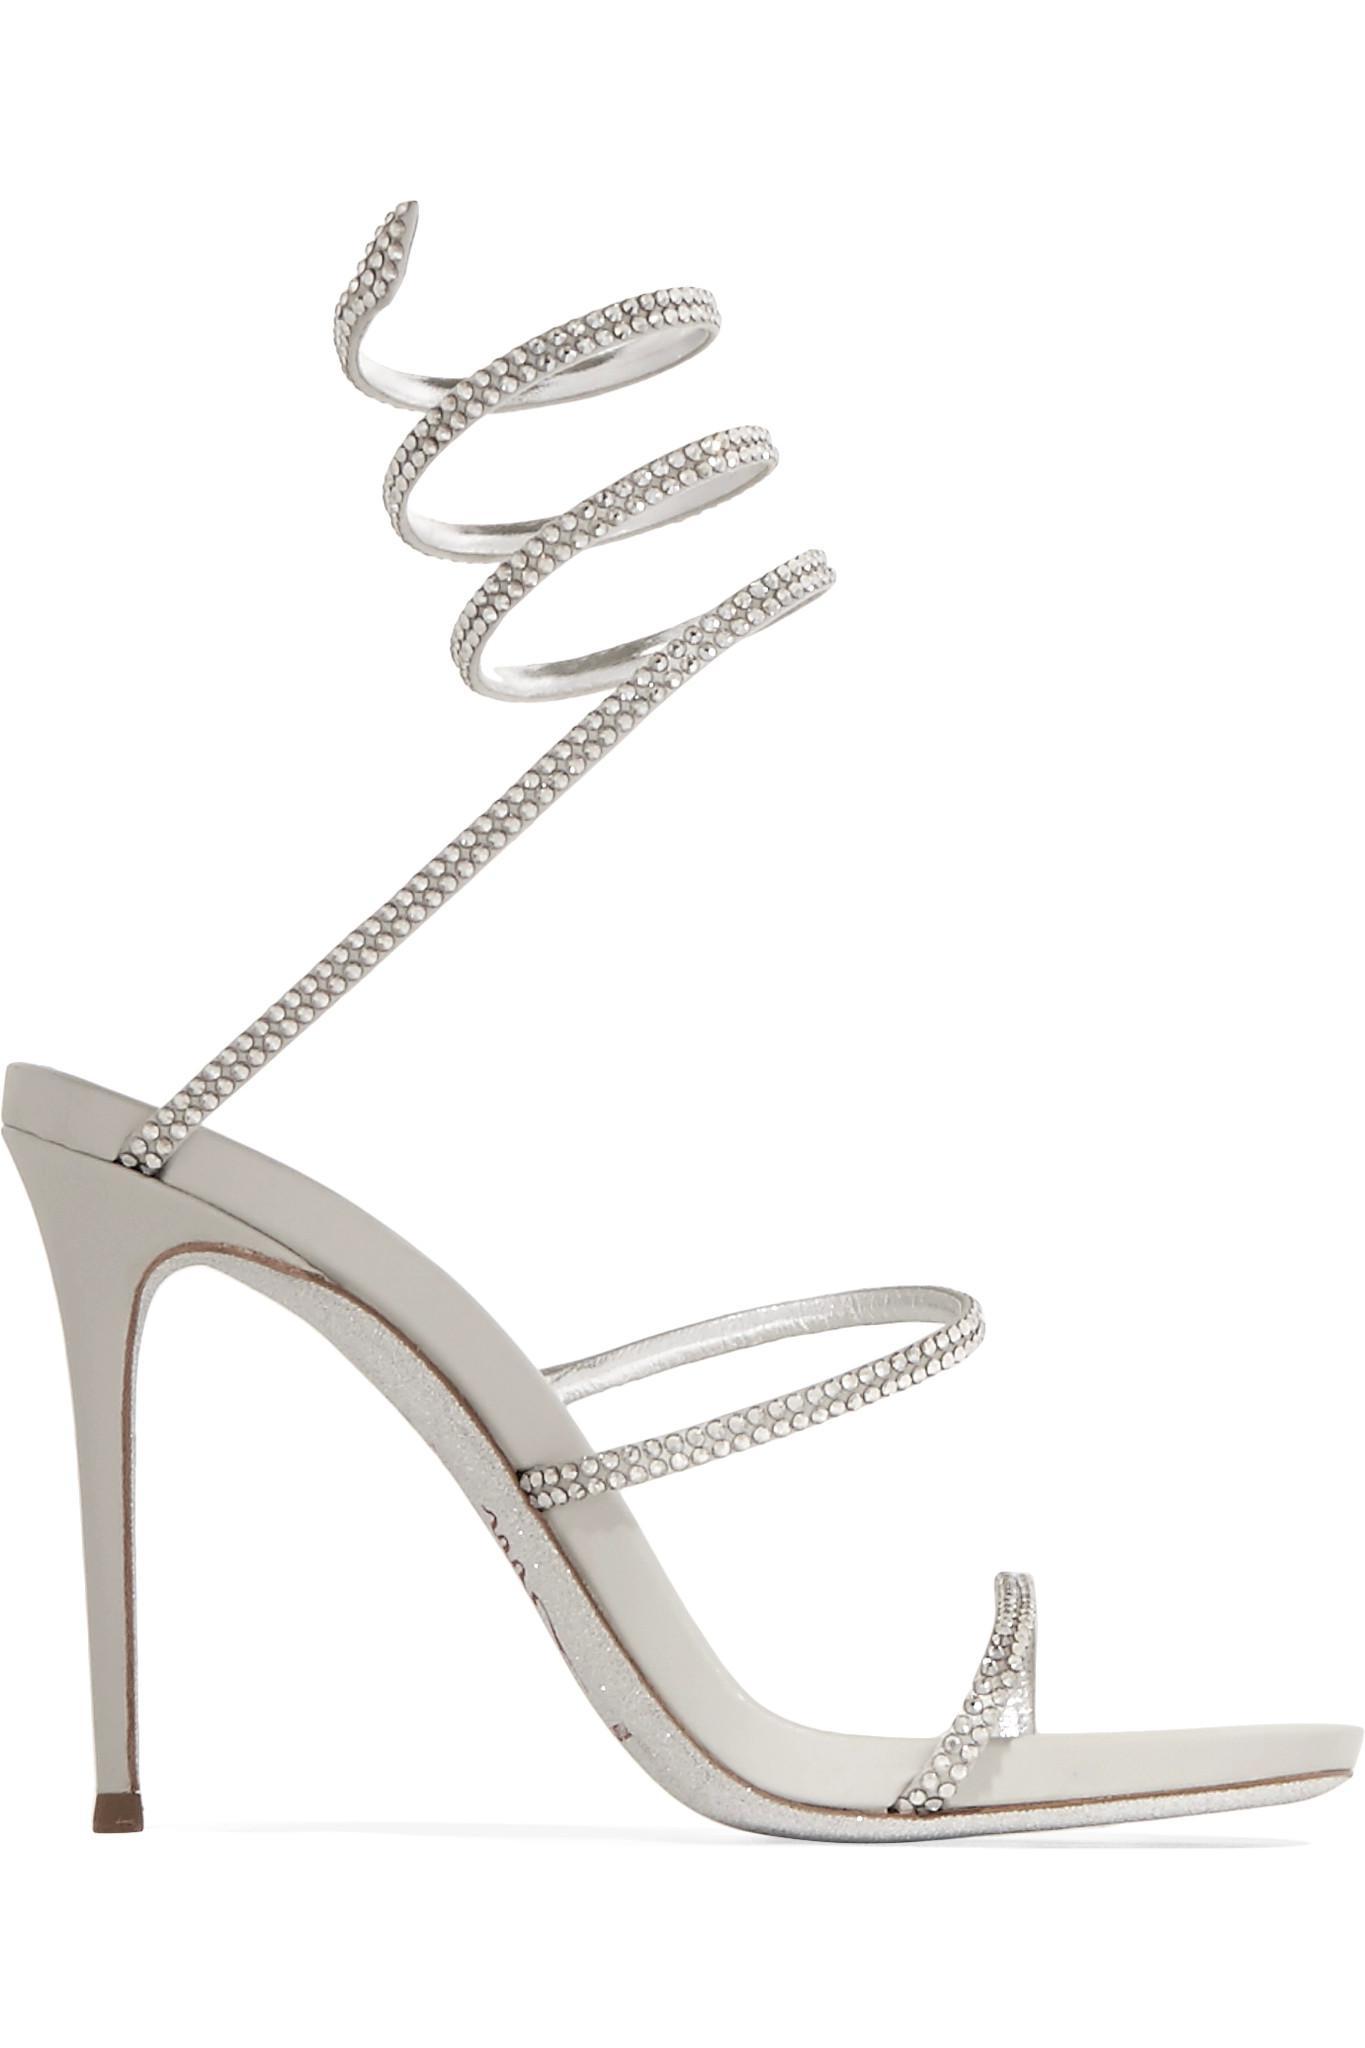 Crystal-embellished Metallic Leather Sandals - Silver Rene Caovilla 21vGs5BlGv